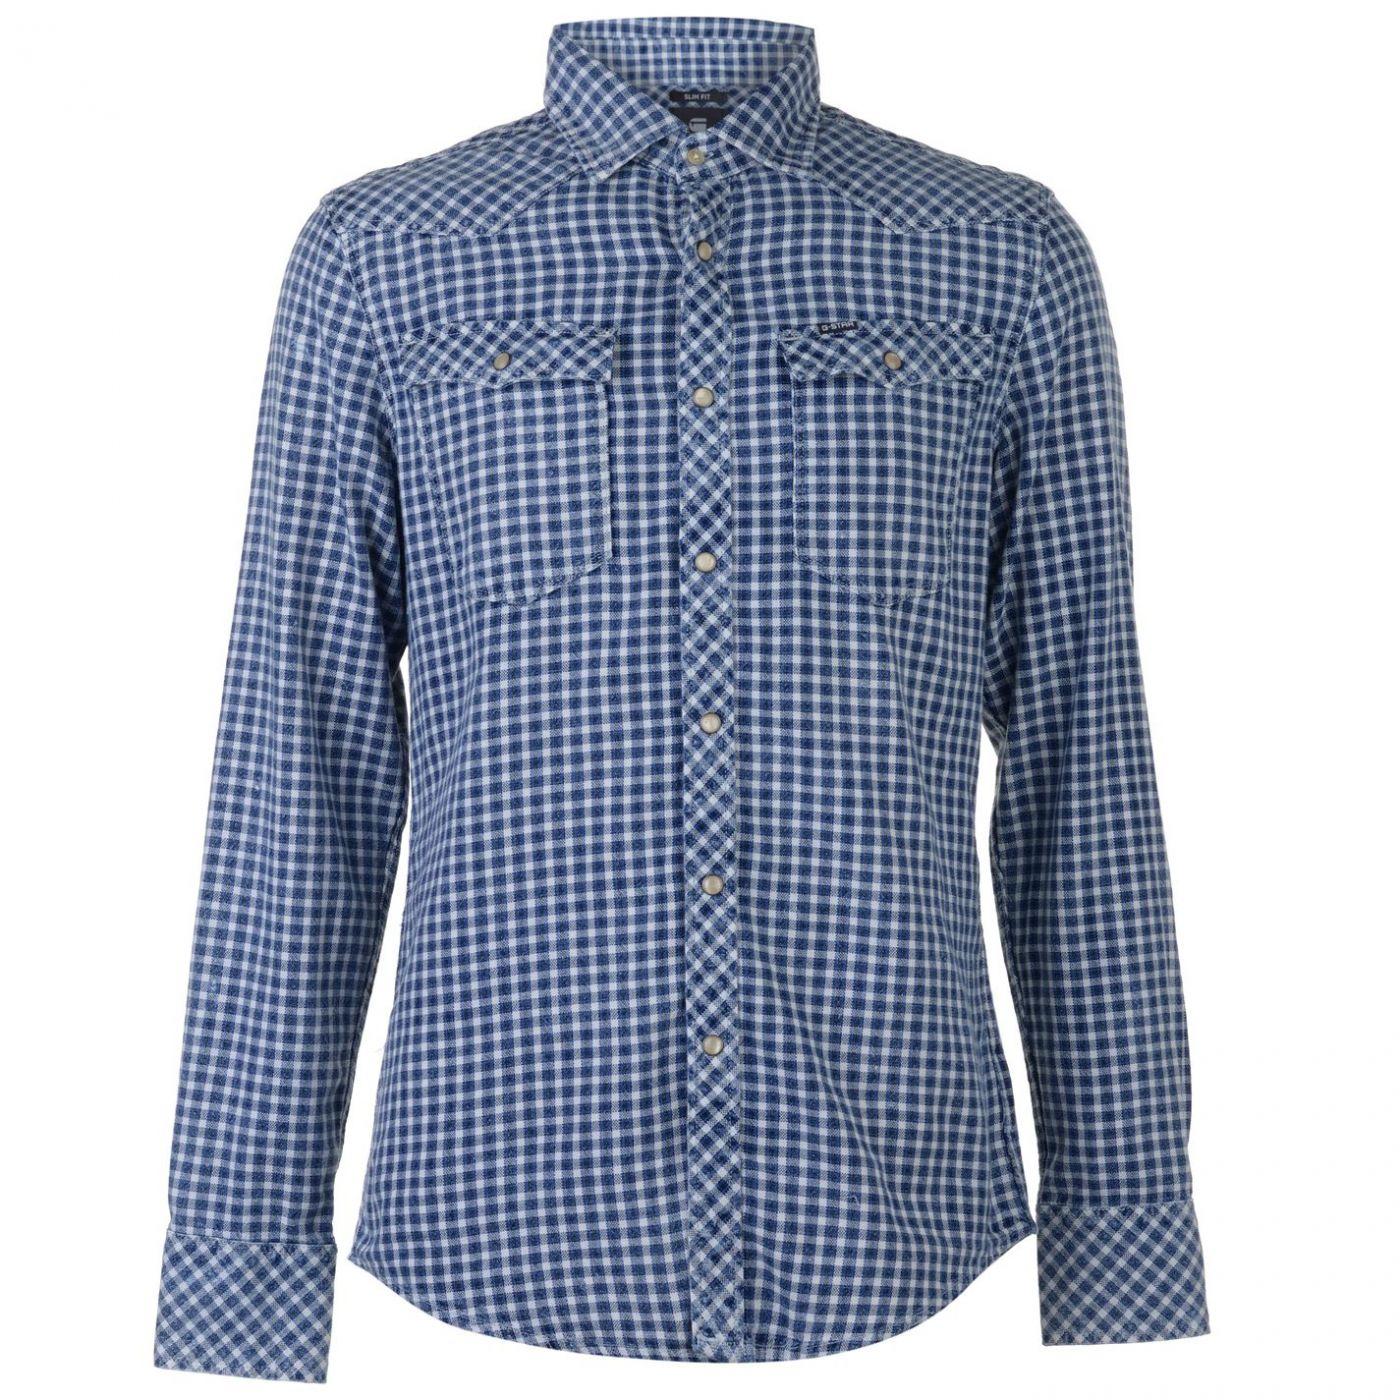 G Star 3301 Long Sleeve Check Shirt